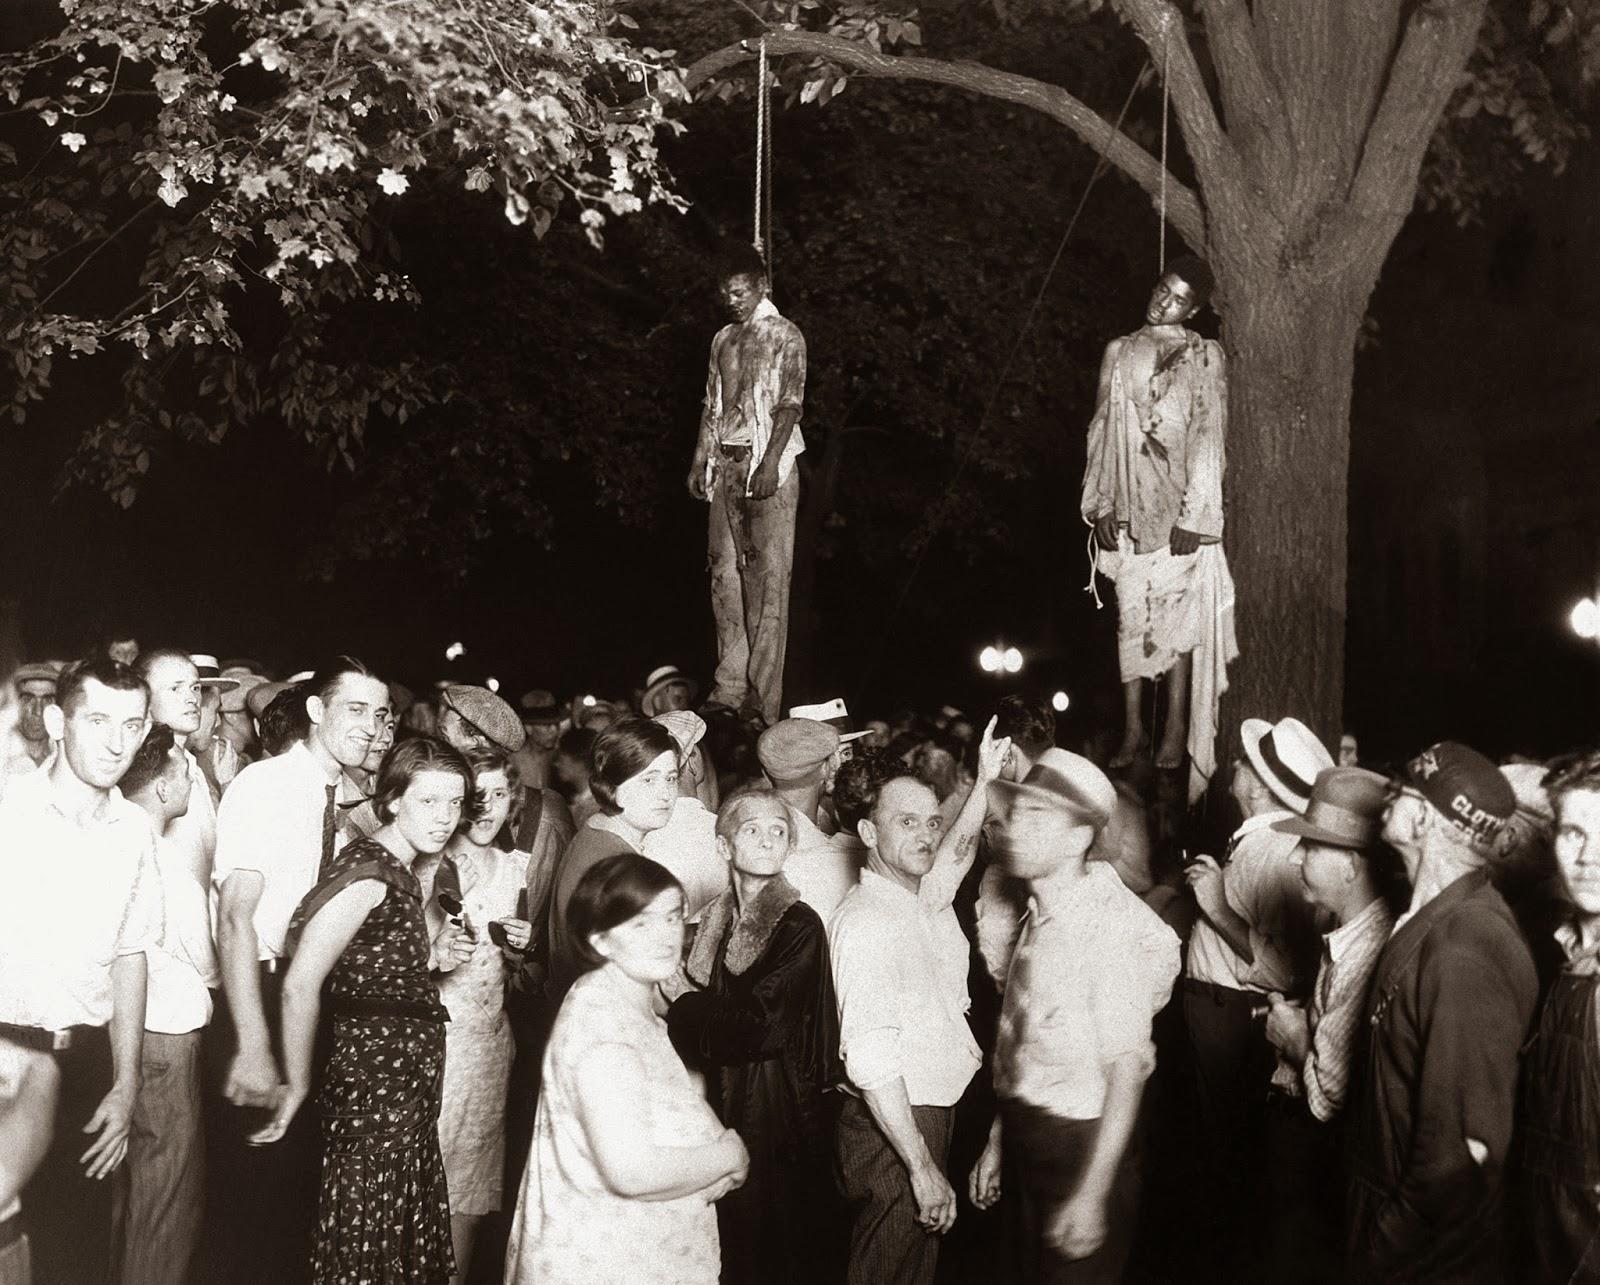 Lynching of Thomas Shipp and Abram Smith, 1930